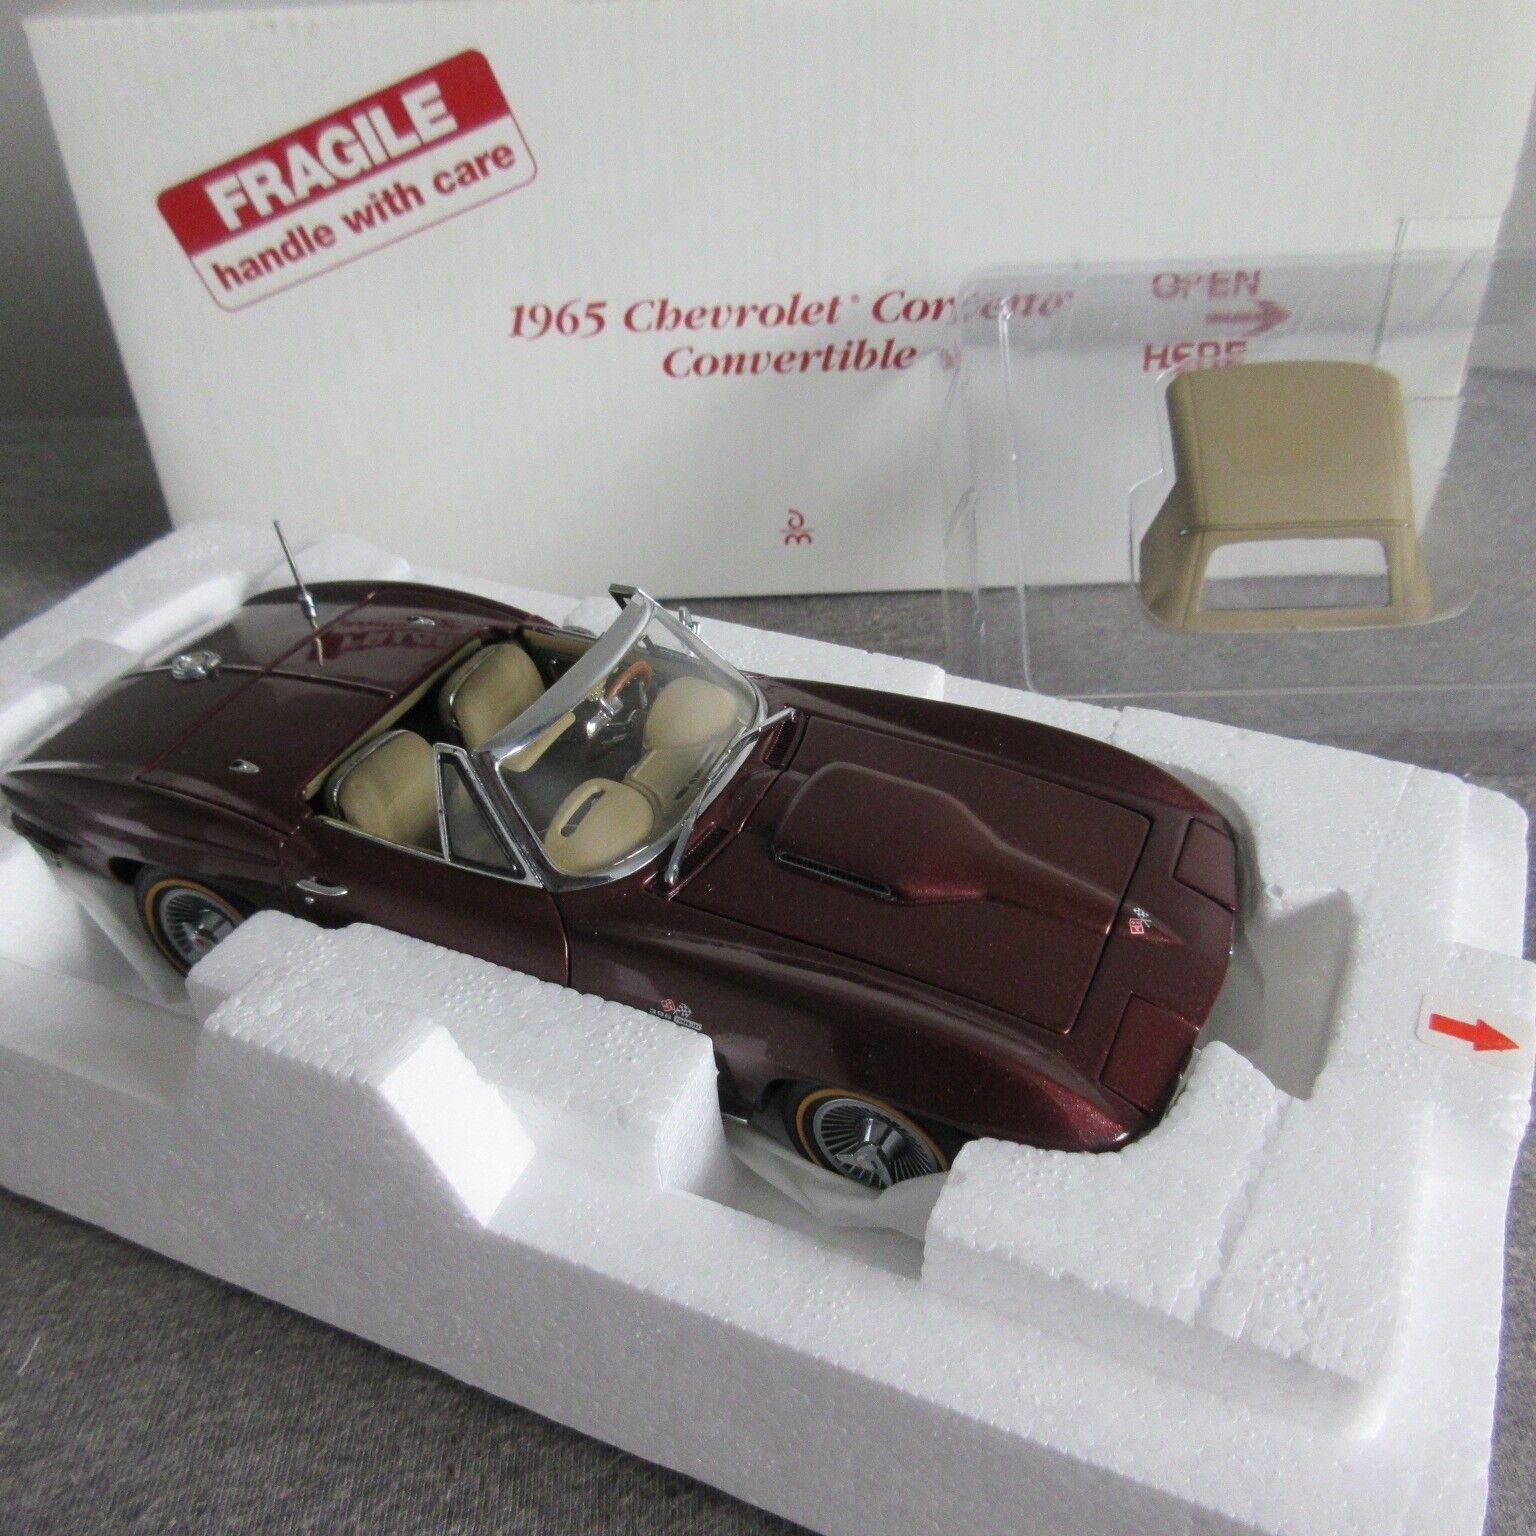 de moda Raro 1965 Corvette Converdeible Granate Danbury Mint Mint Mint 1 24 Diecast Menta en Caja Nuevo En Caja  hasta 42% de descuento